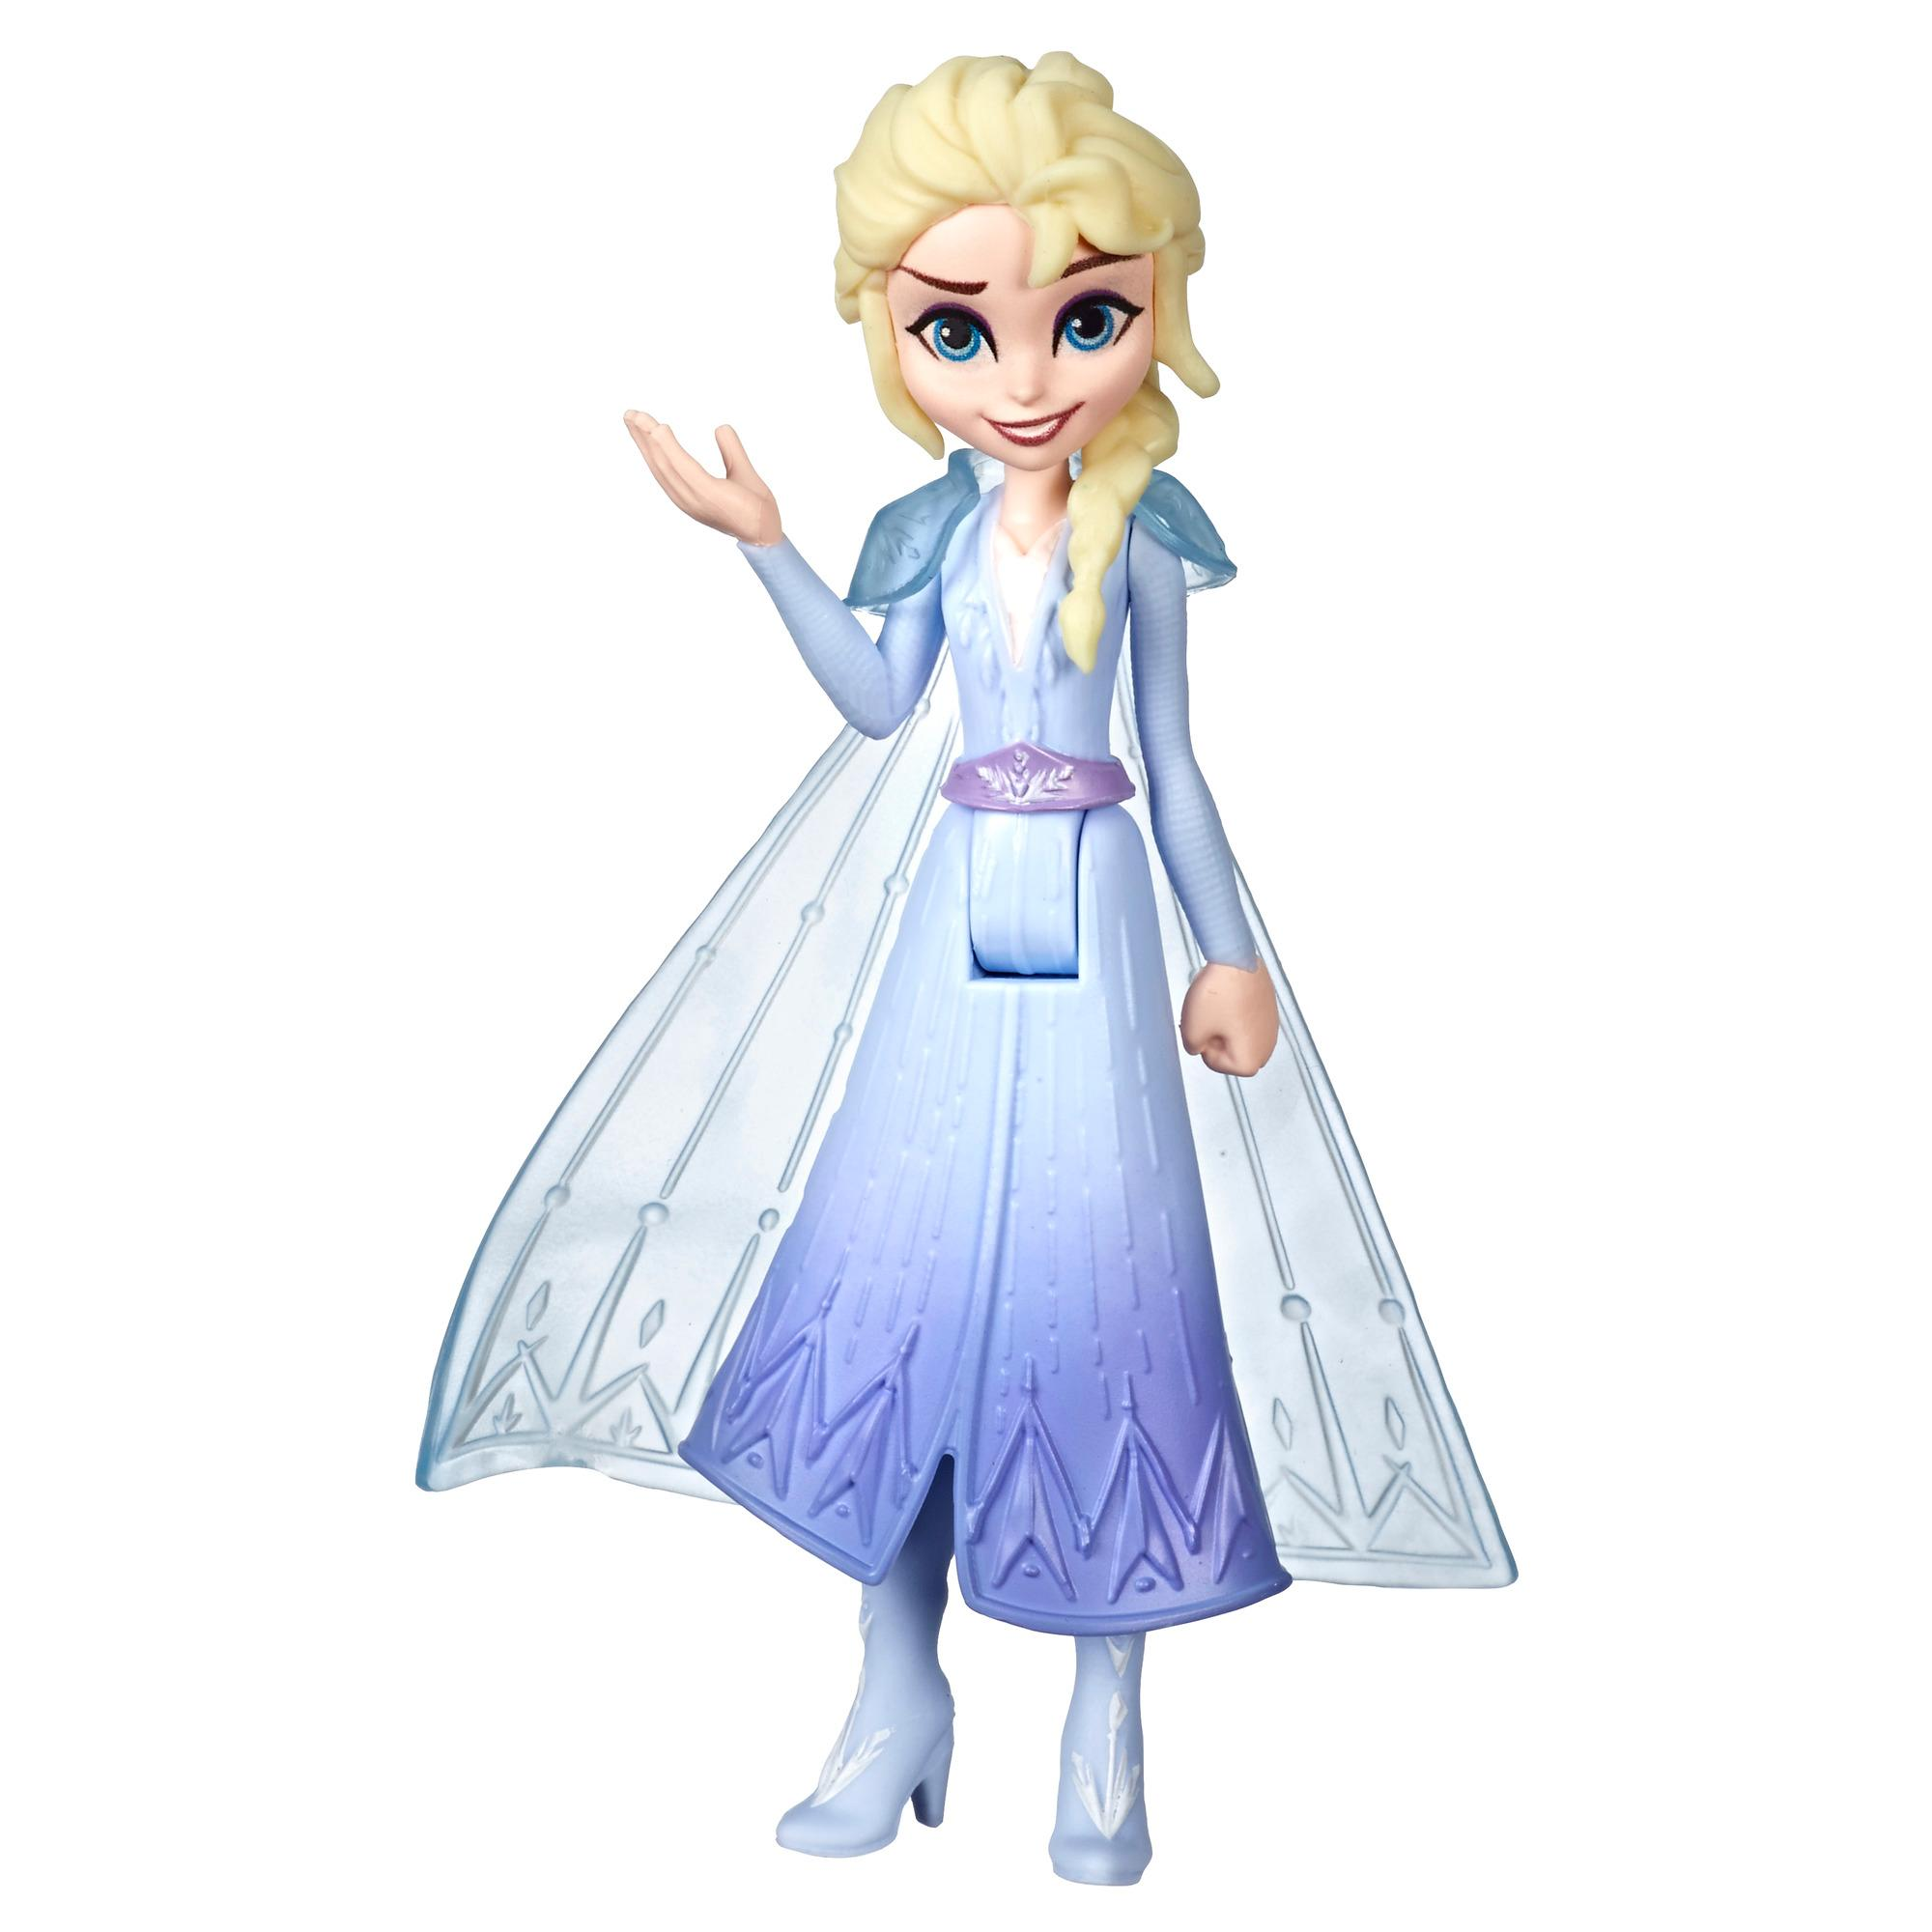 Disney Frozen - Pequeña muñeca de Elsa con capa removible, inspirada en Frozen 2